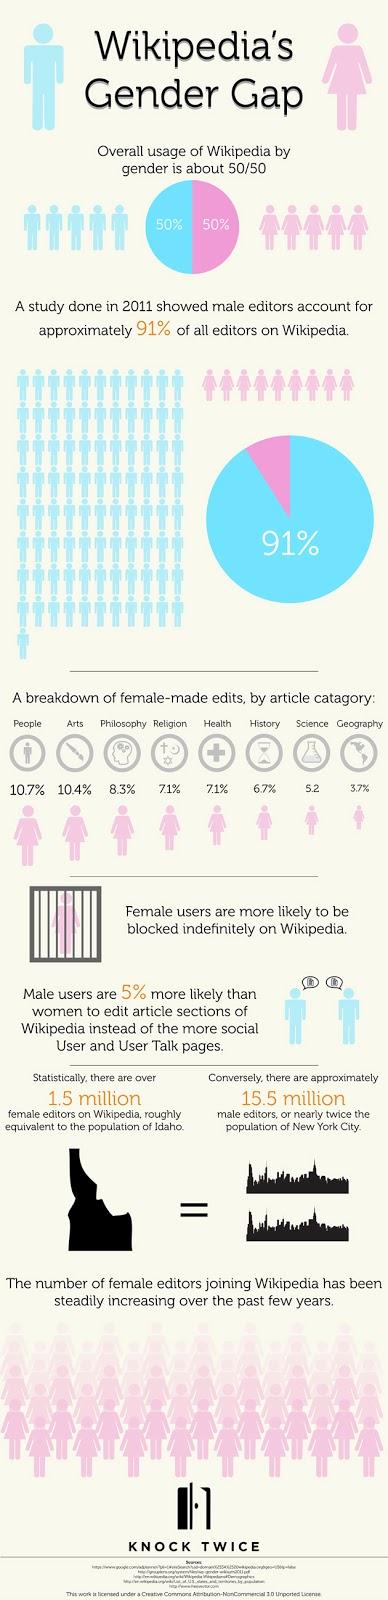 Wikipedia's Gender Gap